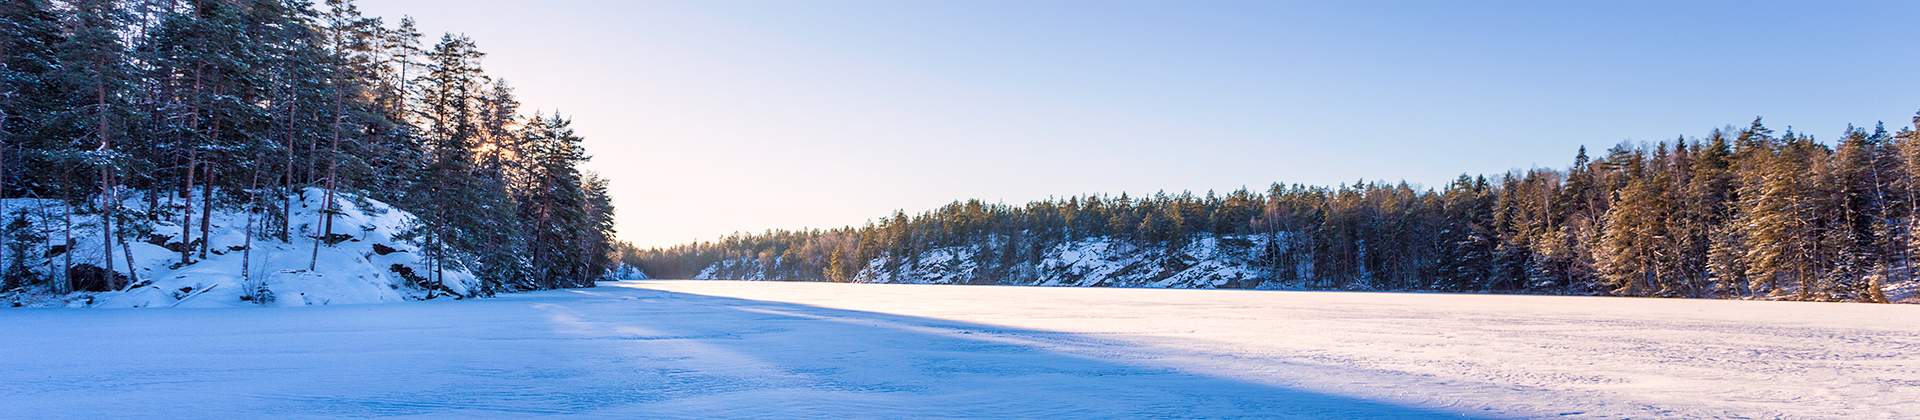 Banner image_Winter_Sami Virtanen